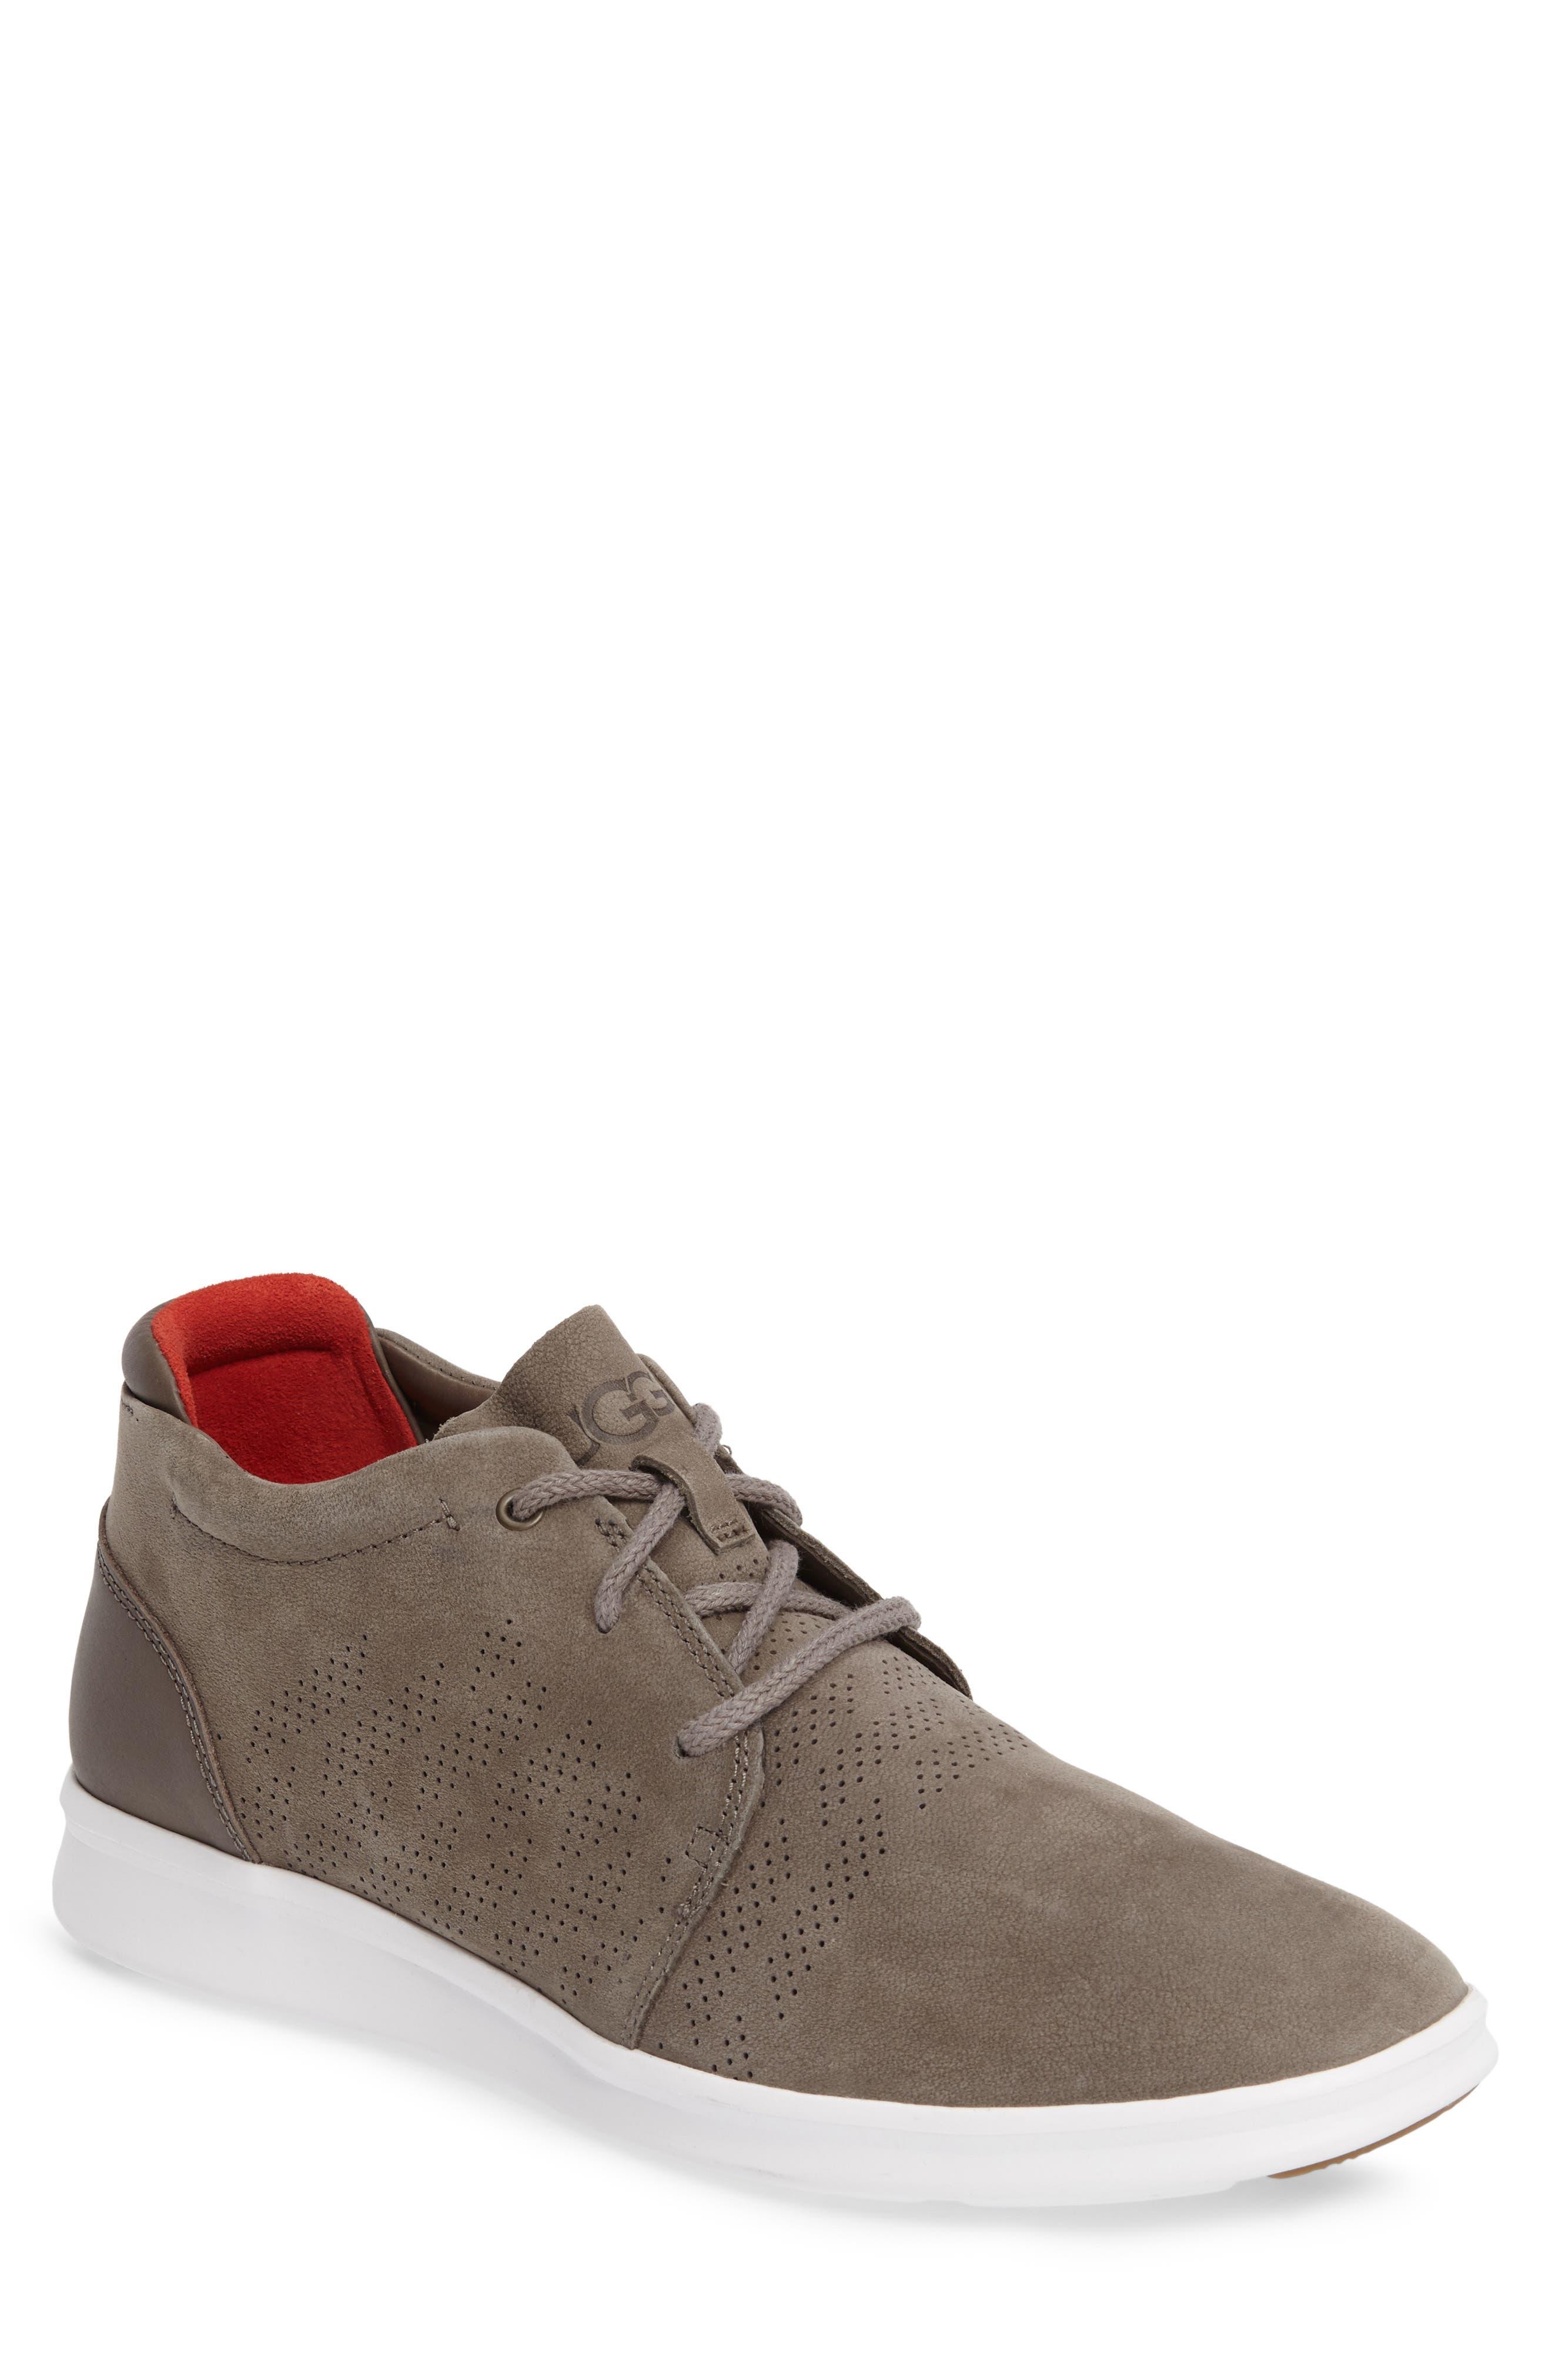 Larken Chukka Sneaker,                         Main,                         color, Mole